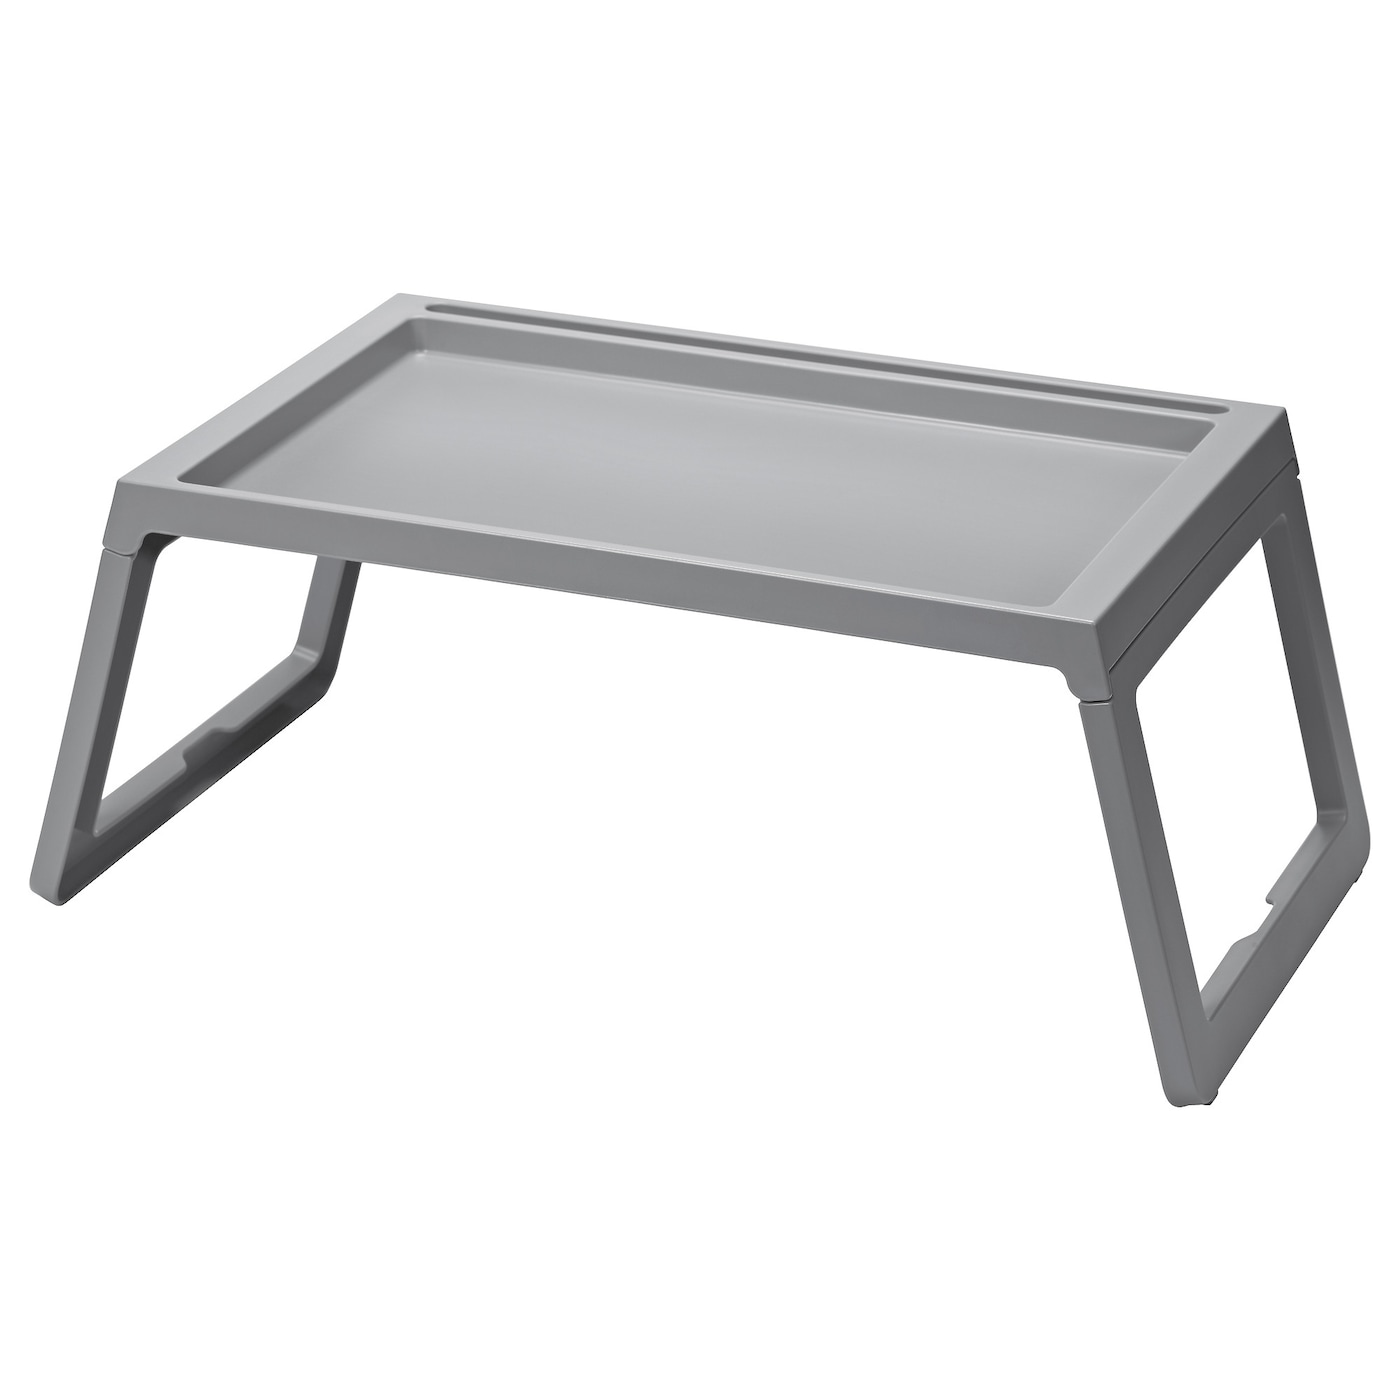 plats de service de table ikea. Black Bedroom Furniture Sets. Home Design Ideas